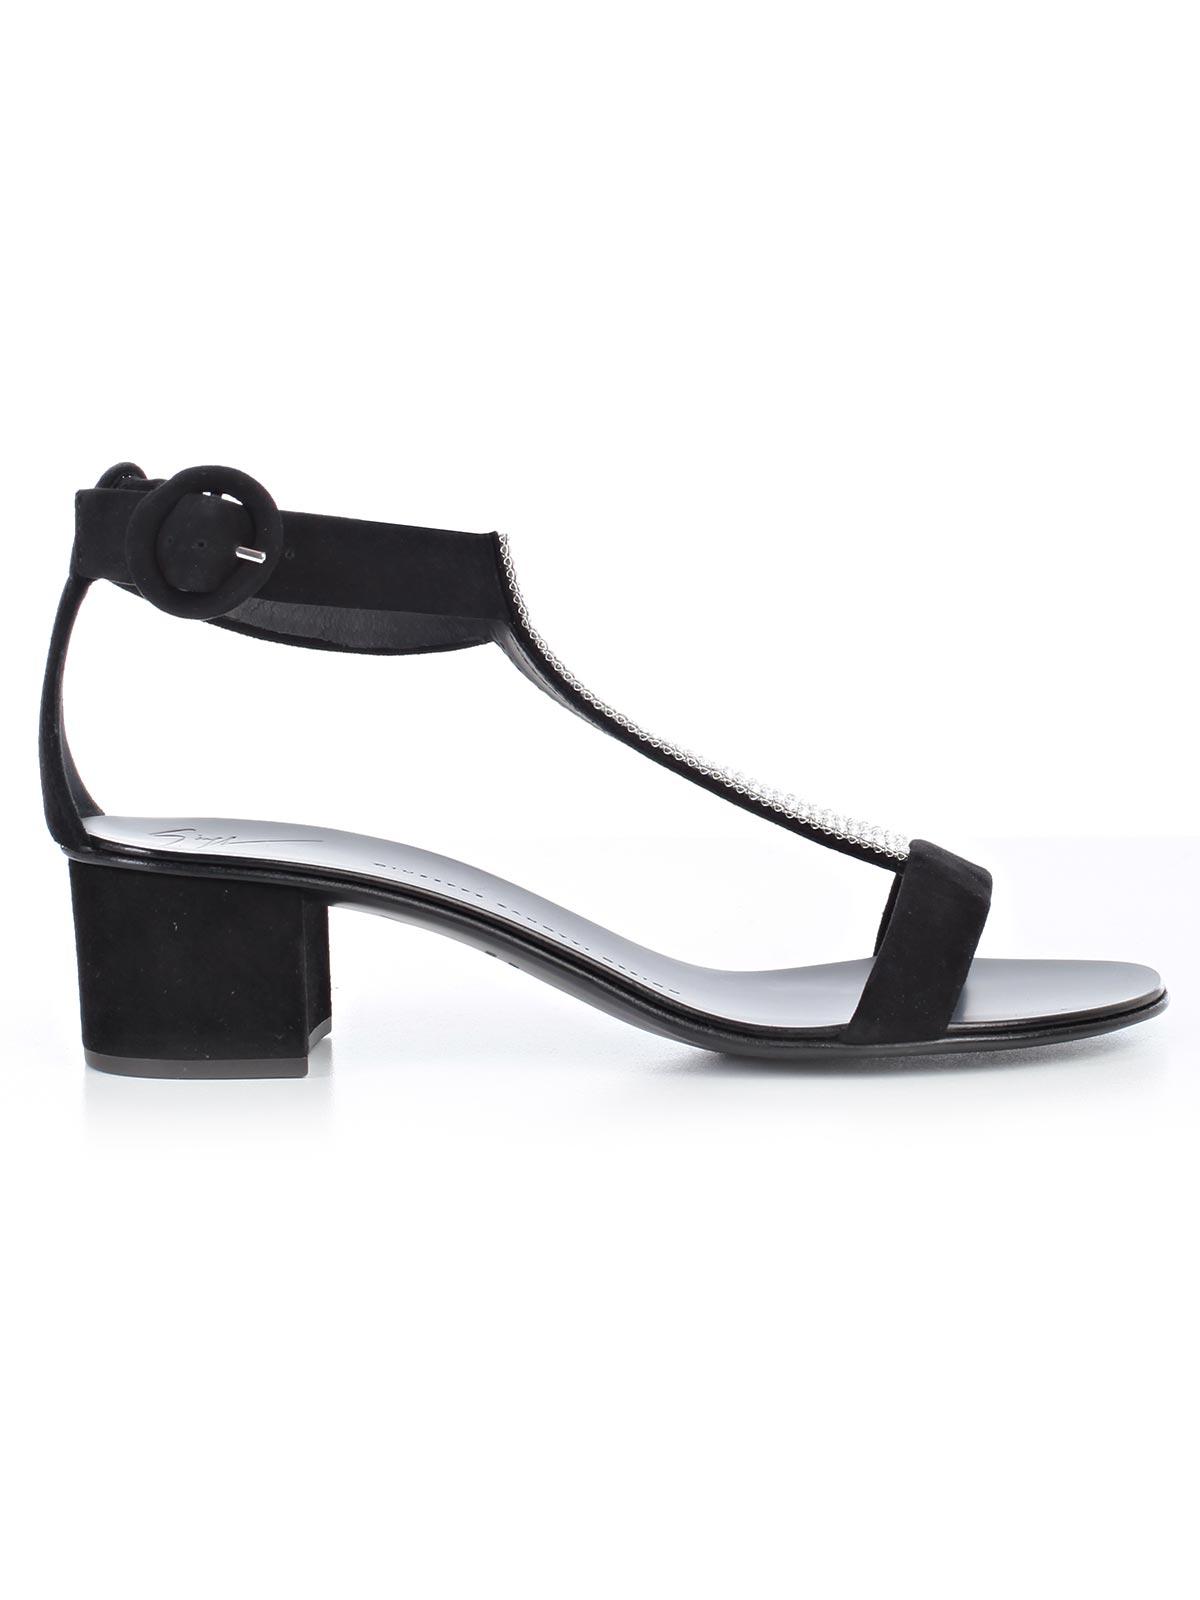 Picture of GIUSEPPE ZANOTTI FOOTWEAR